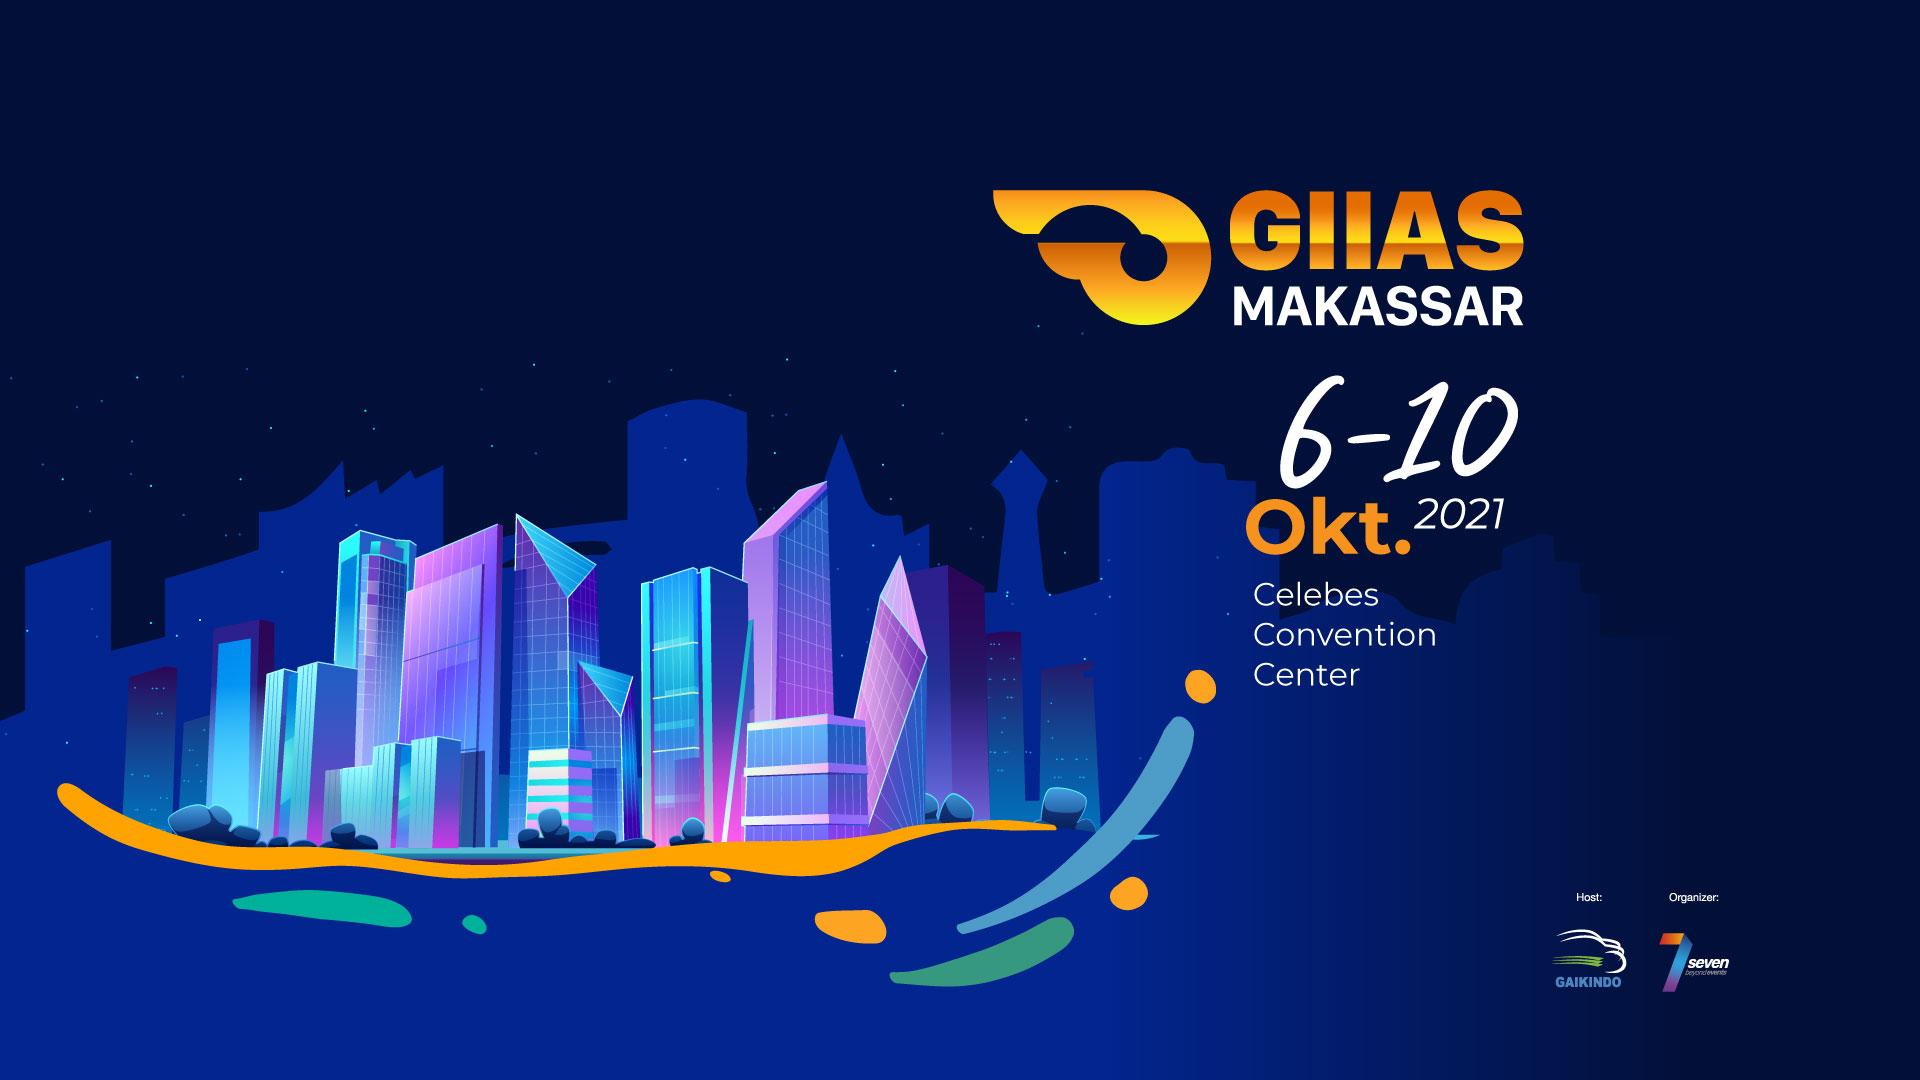 GIIAS Makassar 2021